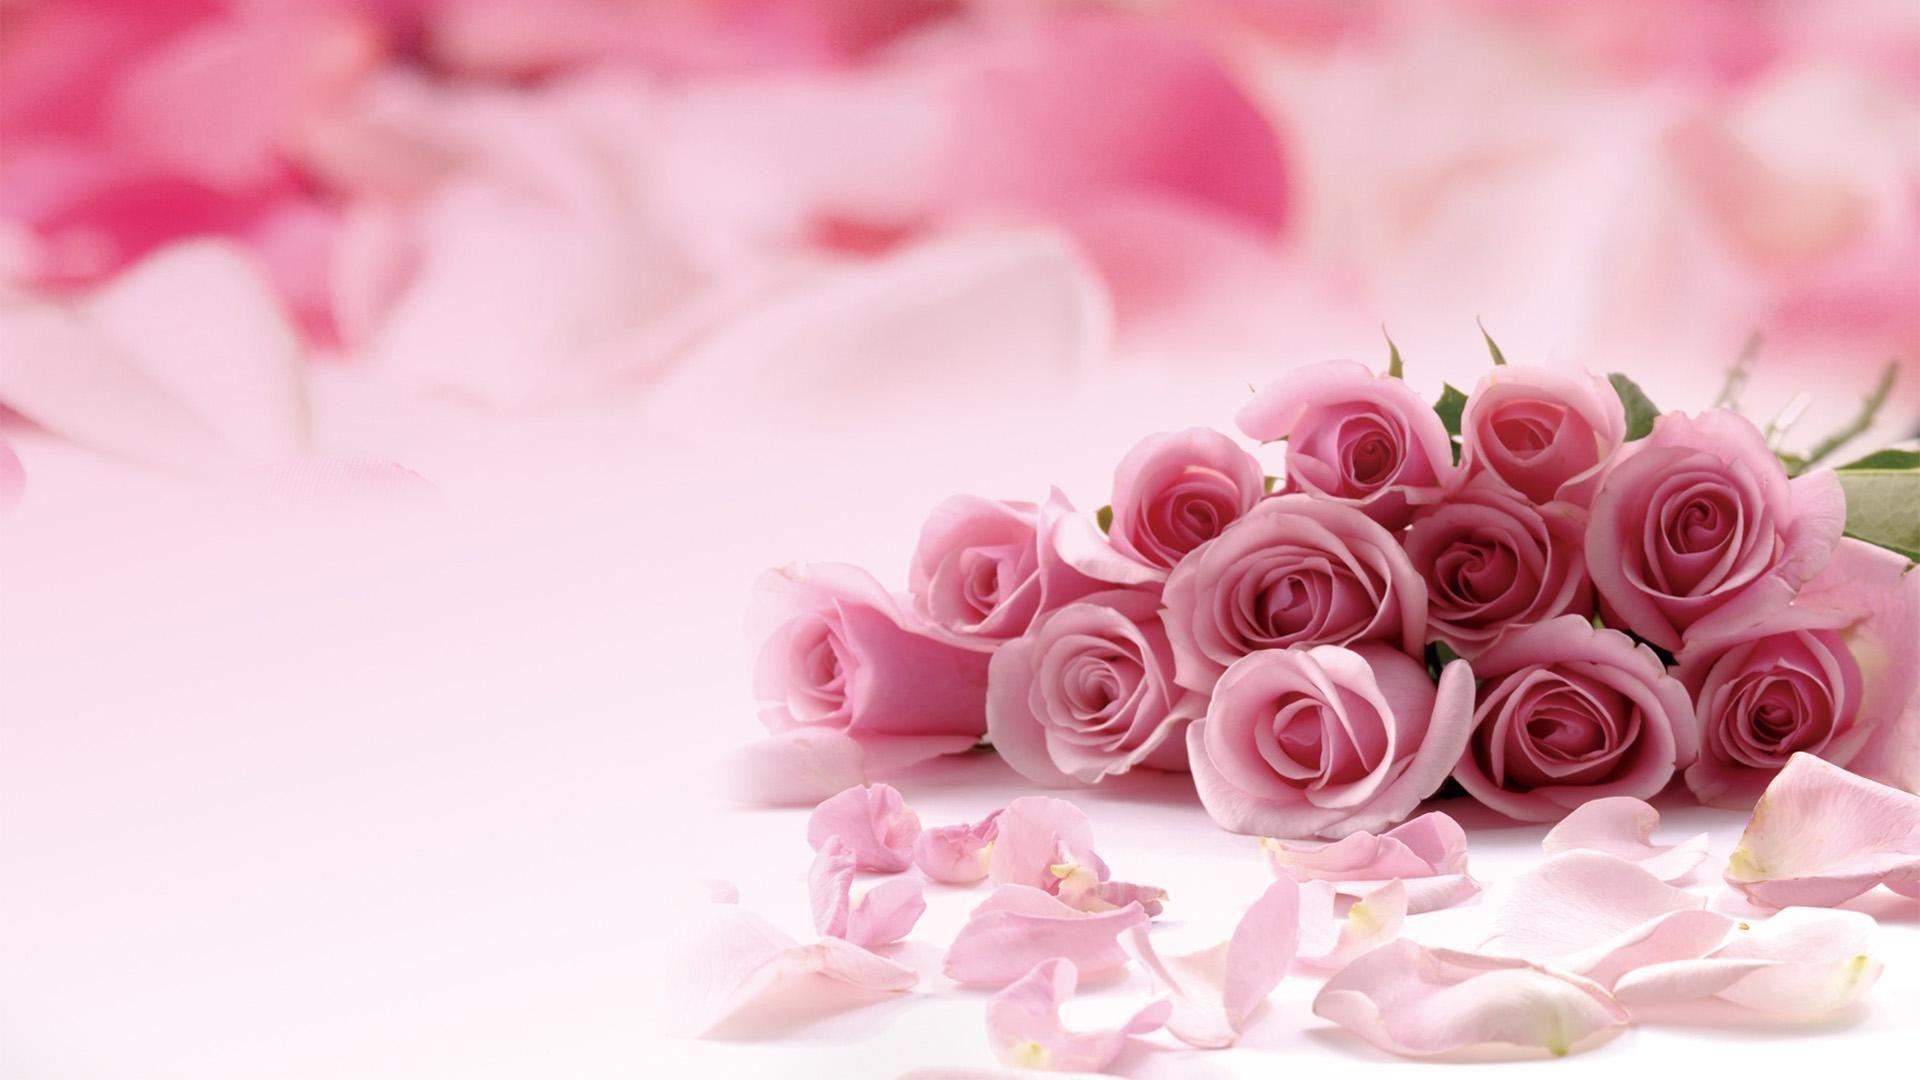 pink roses picture hd desktop wallpaper 1920x1080 pink